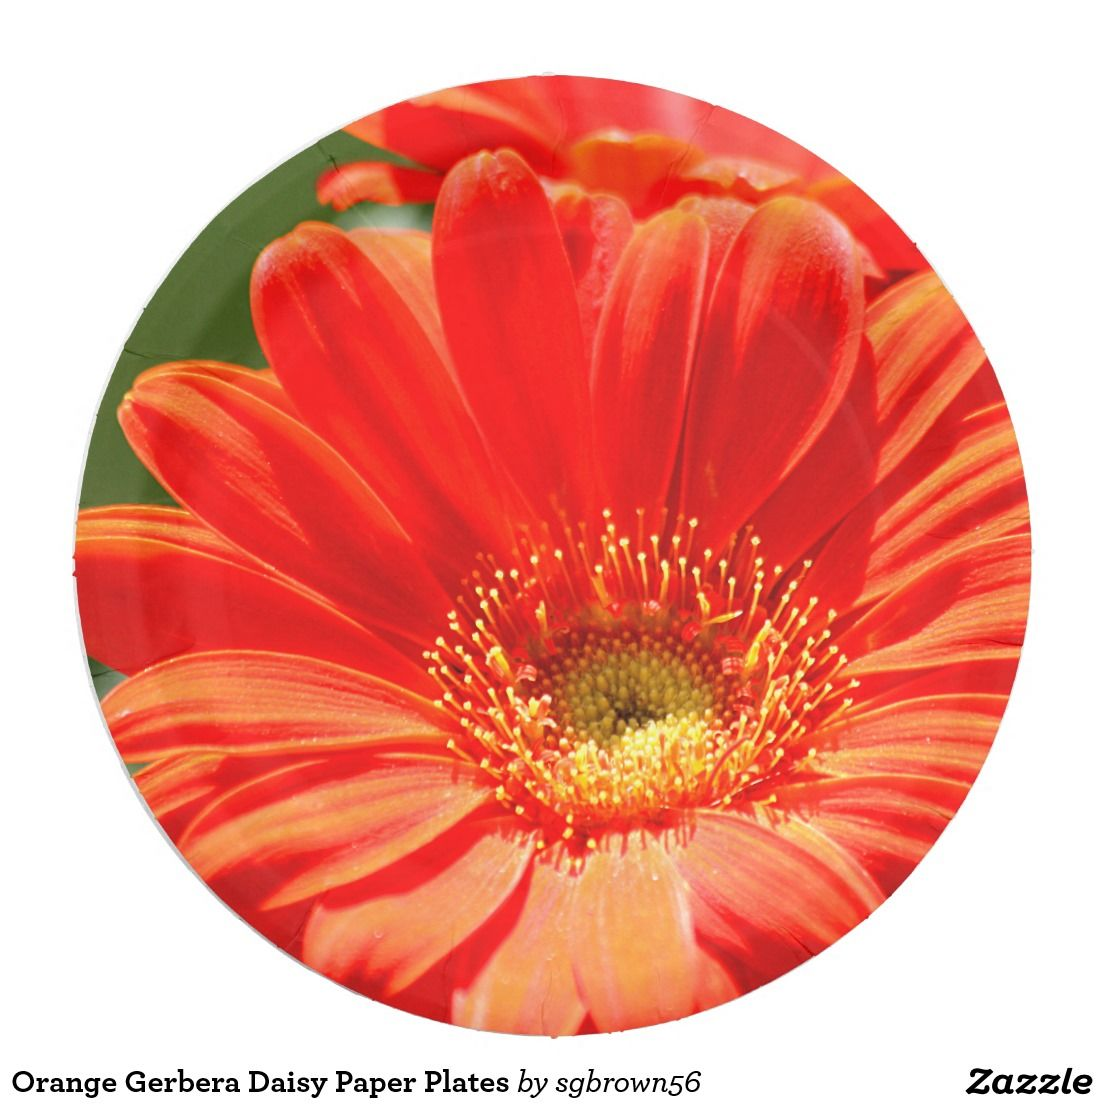 Orange Gerbera Daisy Paper Plates | Pinterest | Gerbera